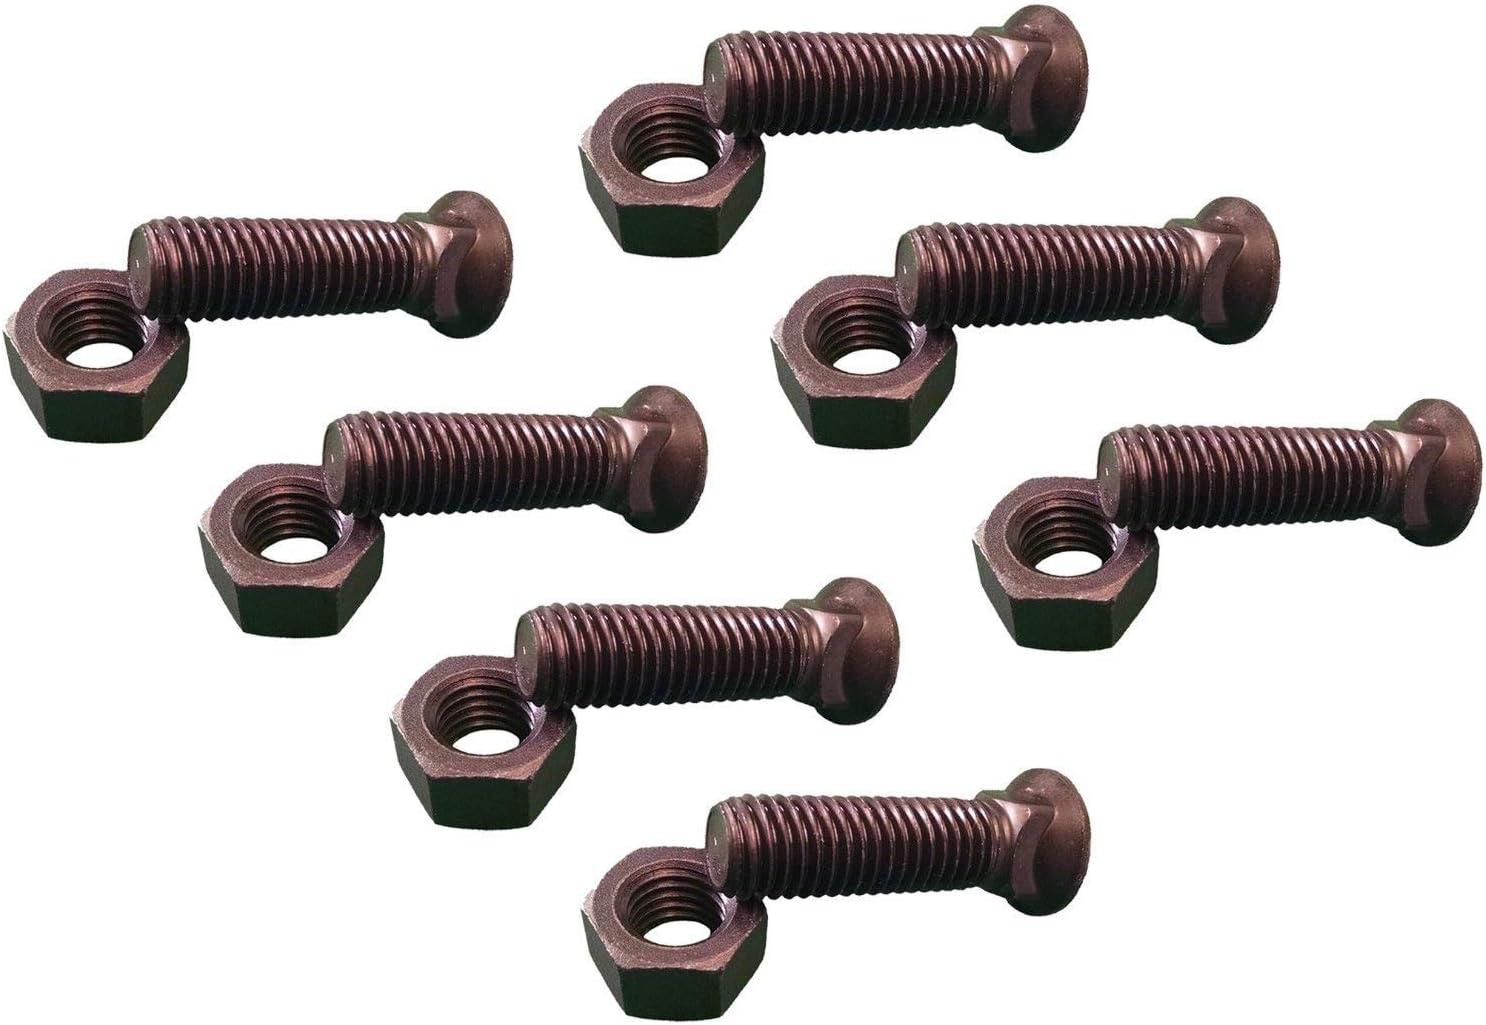 Grade 8 3//4-10X2 1//2 7 Plow Bolt /& Nut for Blades//Cutting Edge Dome Head